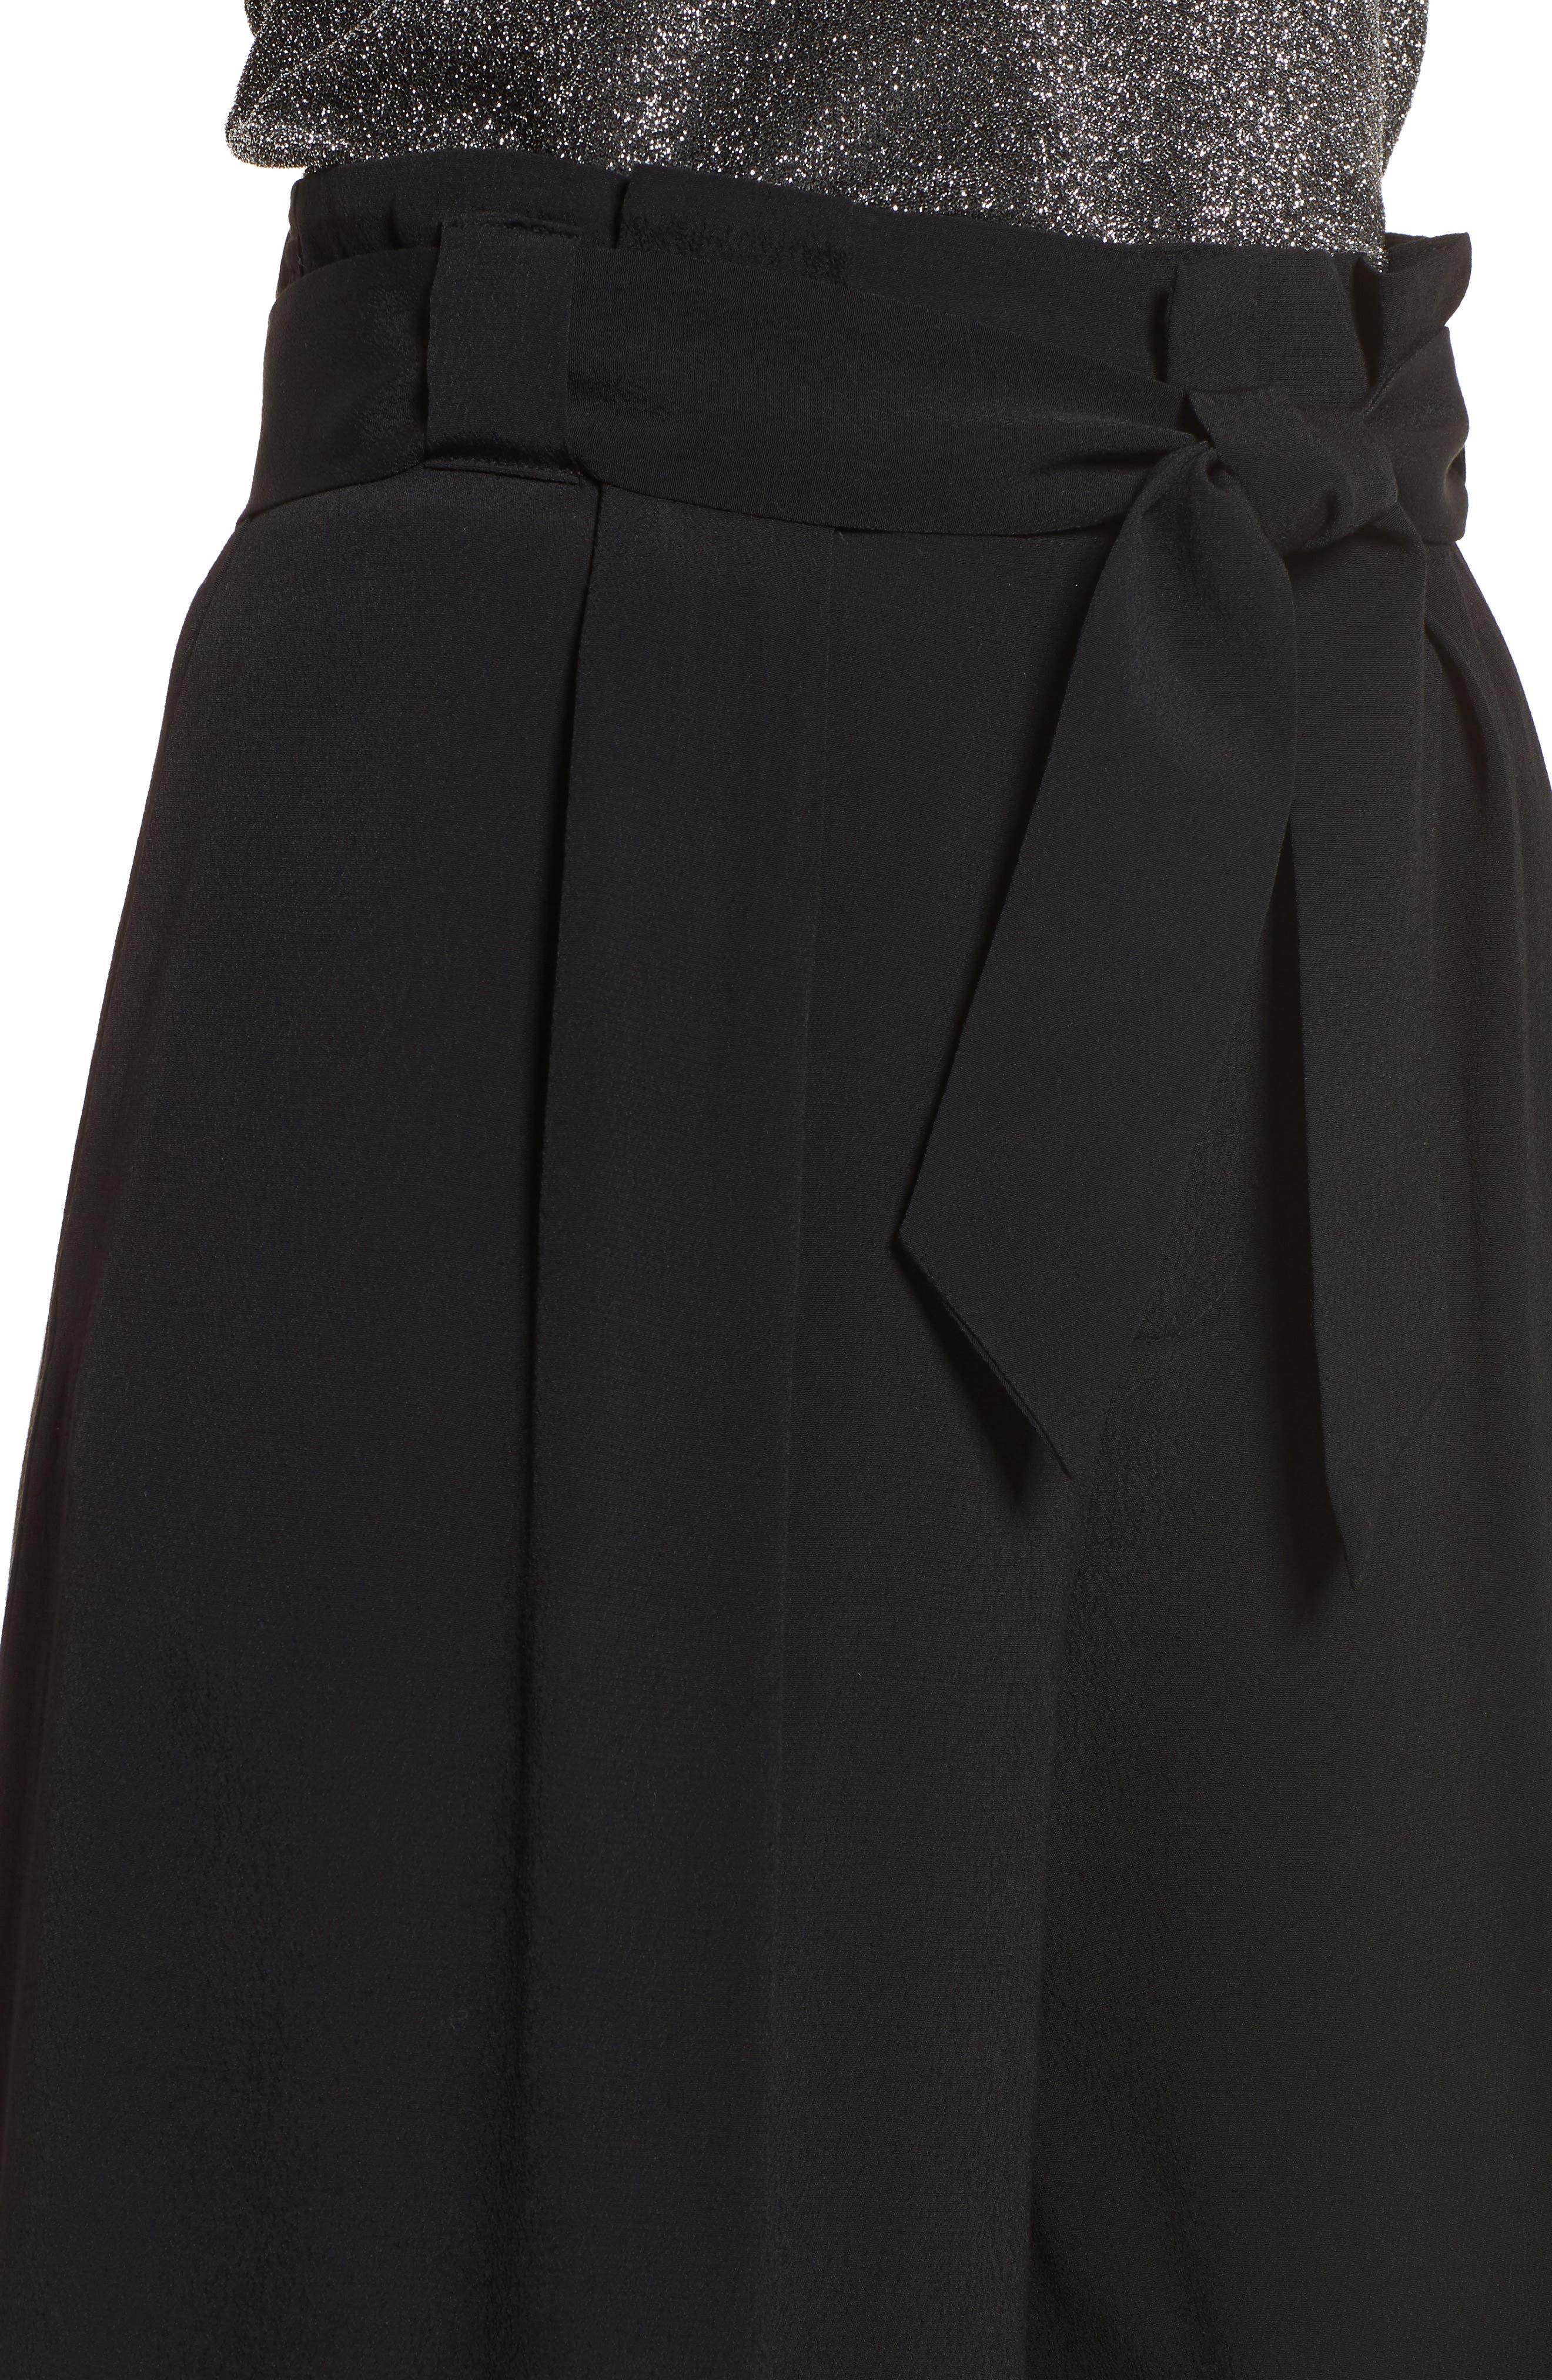 Paperbag Waist Culottes,                             Alternate thumbnail 4, color,                             001